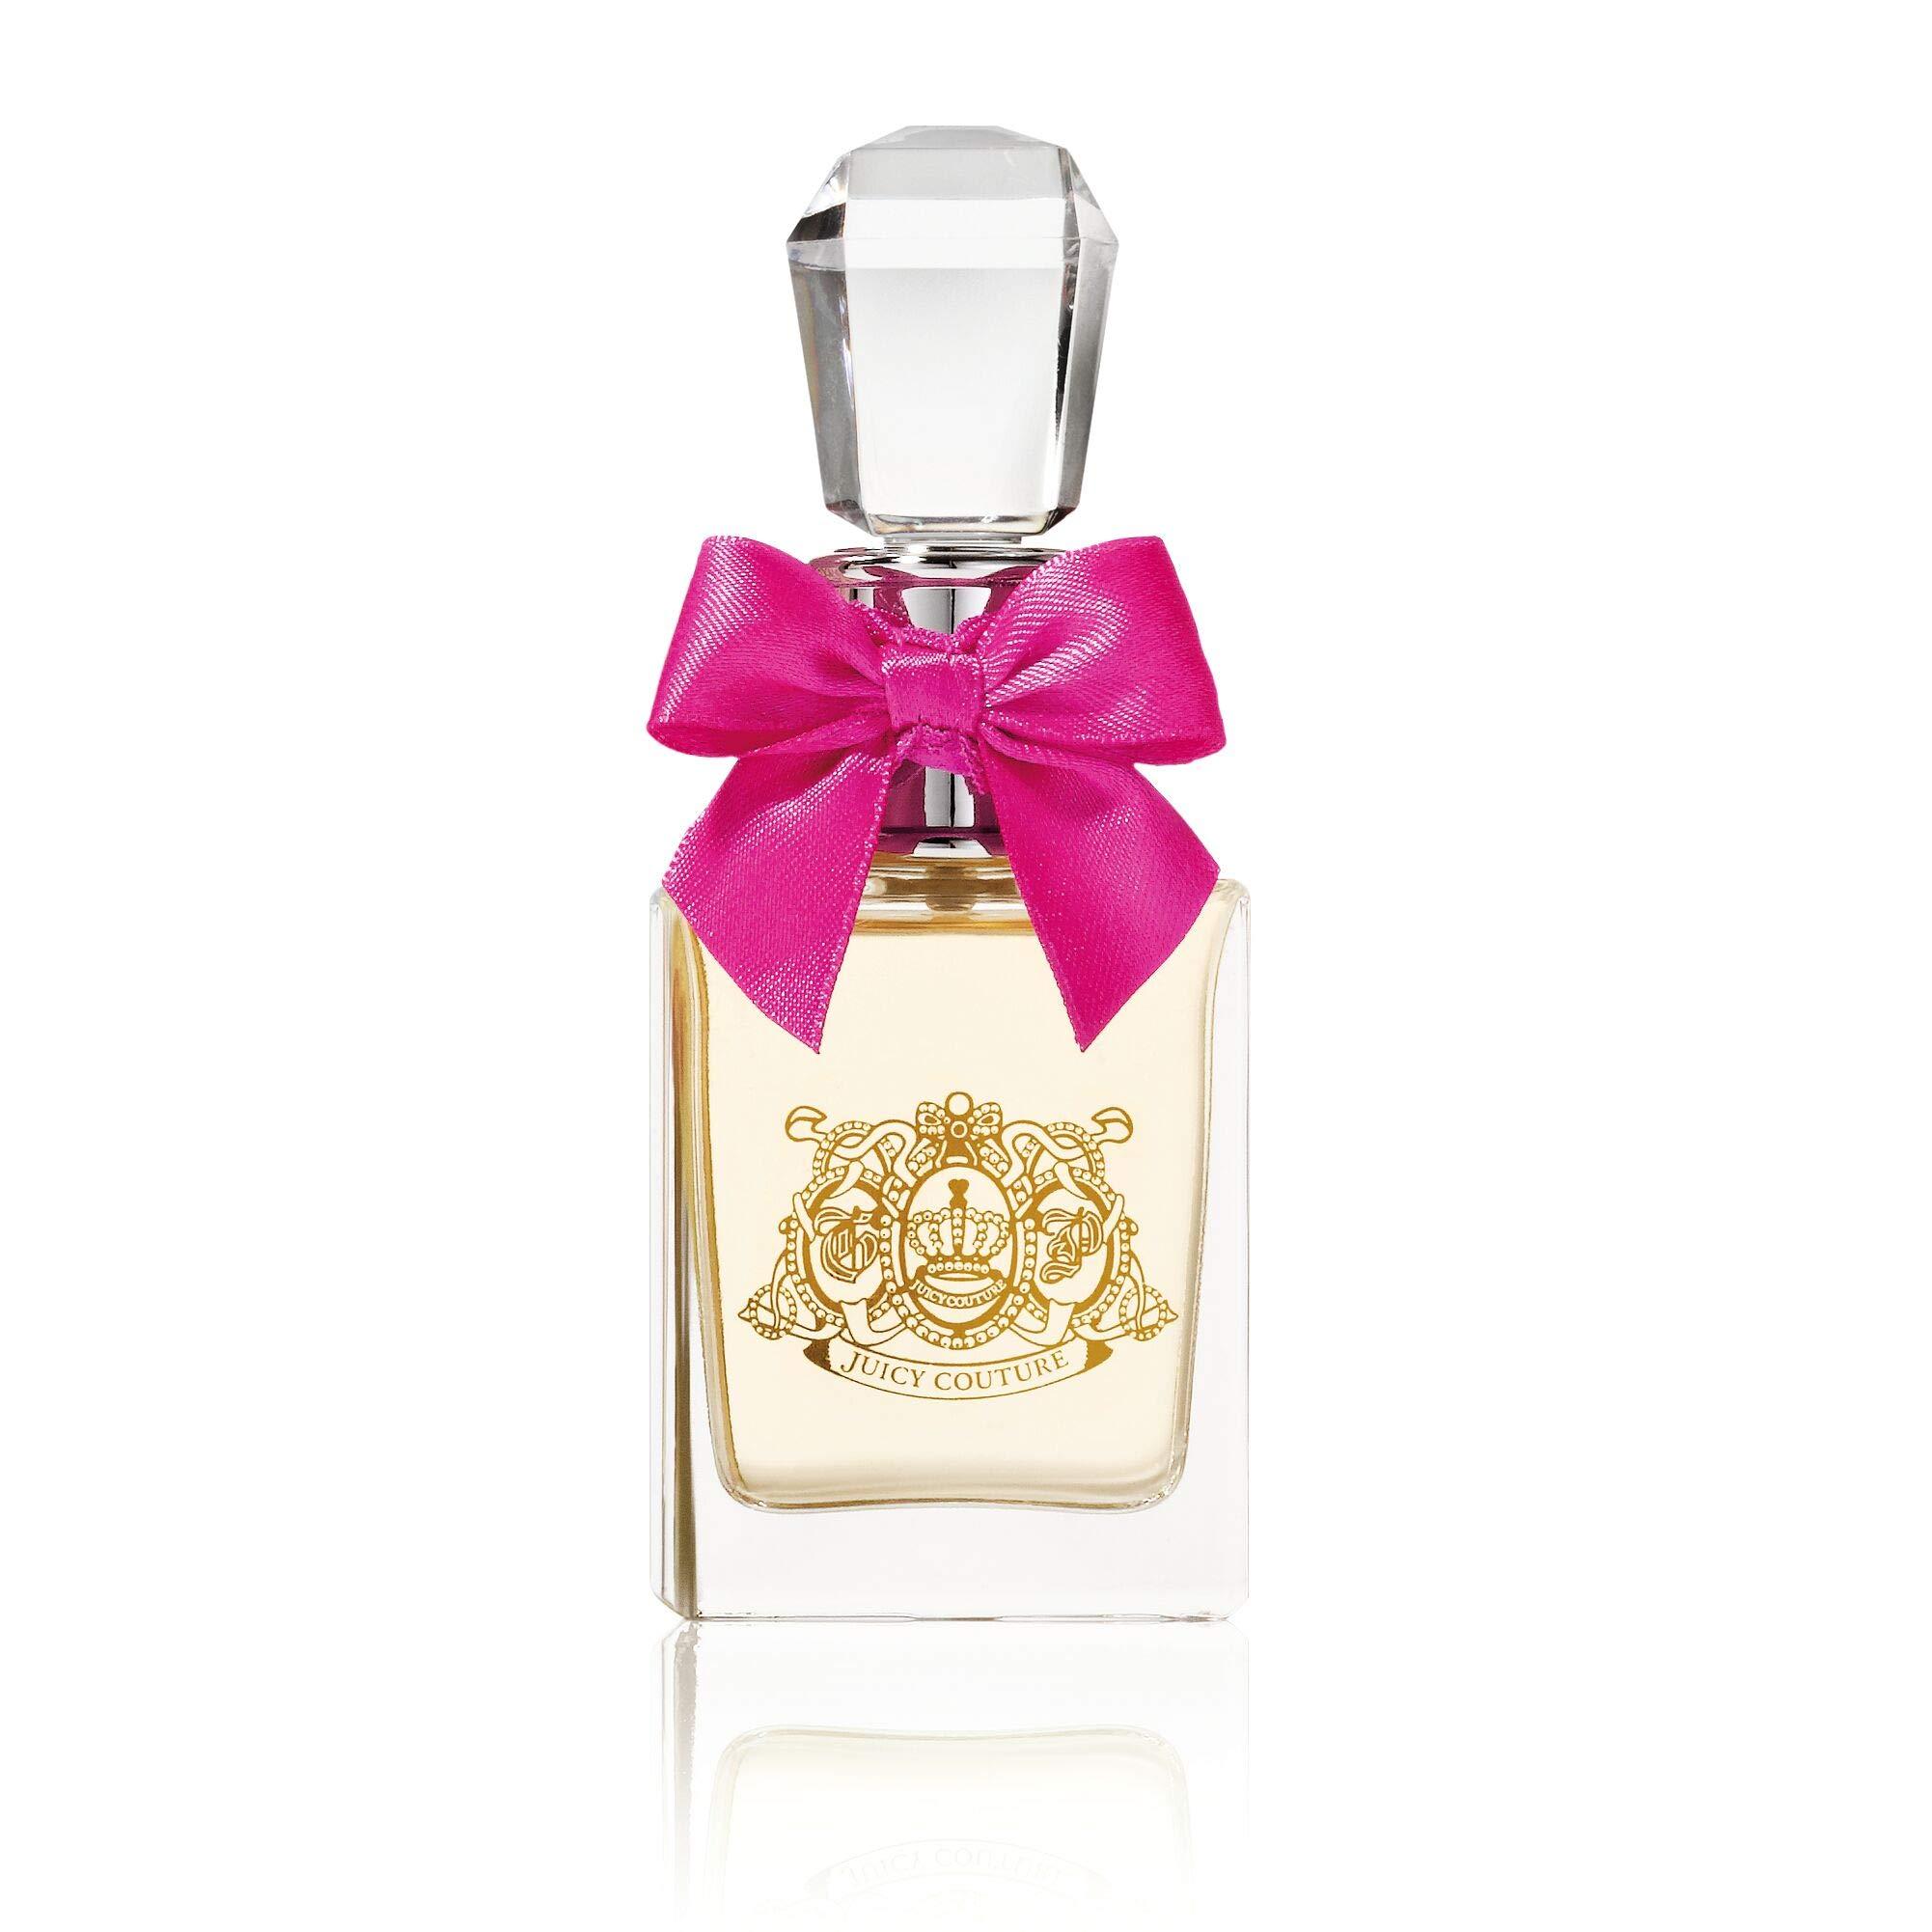 Juicy Couture Viva La Juicy Perfume for Women, 1.0 fl. oz.  EDP by Juicy Couture (Image #2)